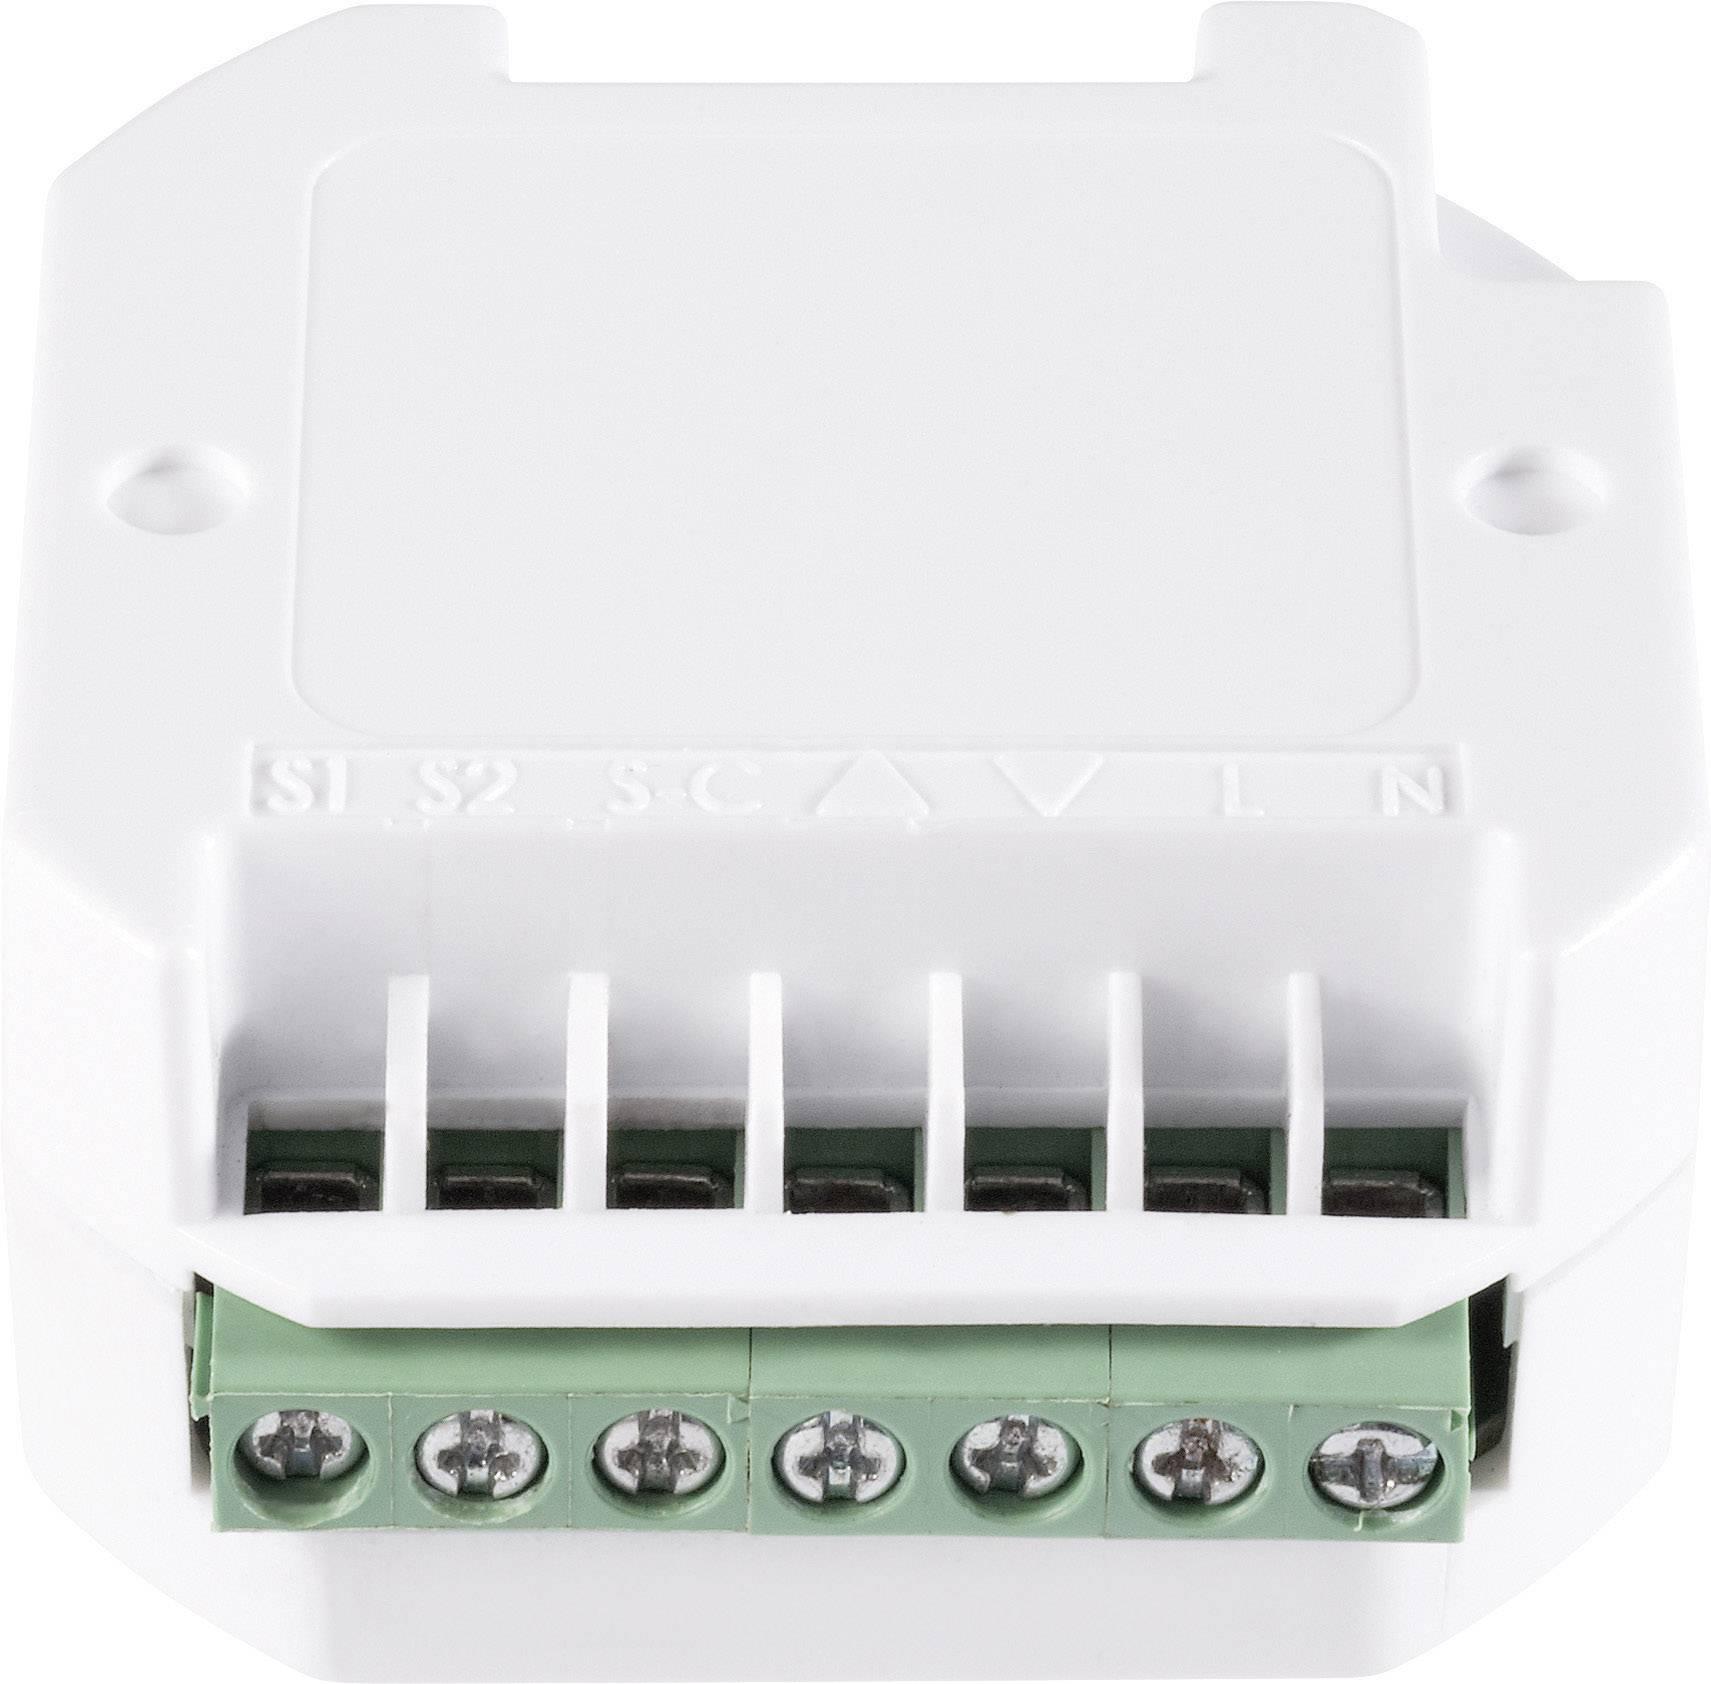 Bezdrôtový oladač roliet do krabice RSL, max. 500 W